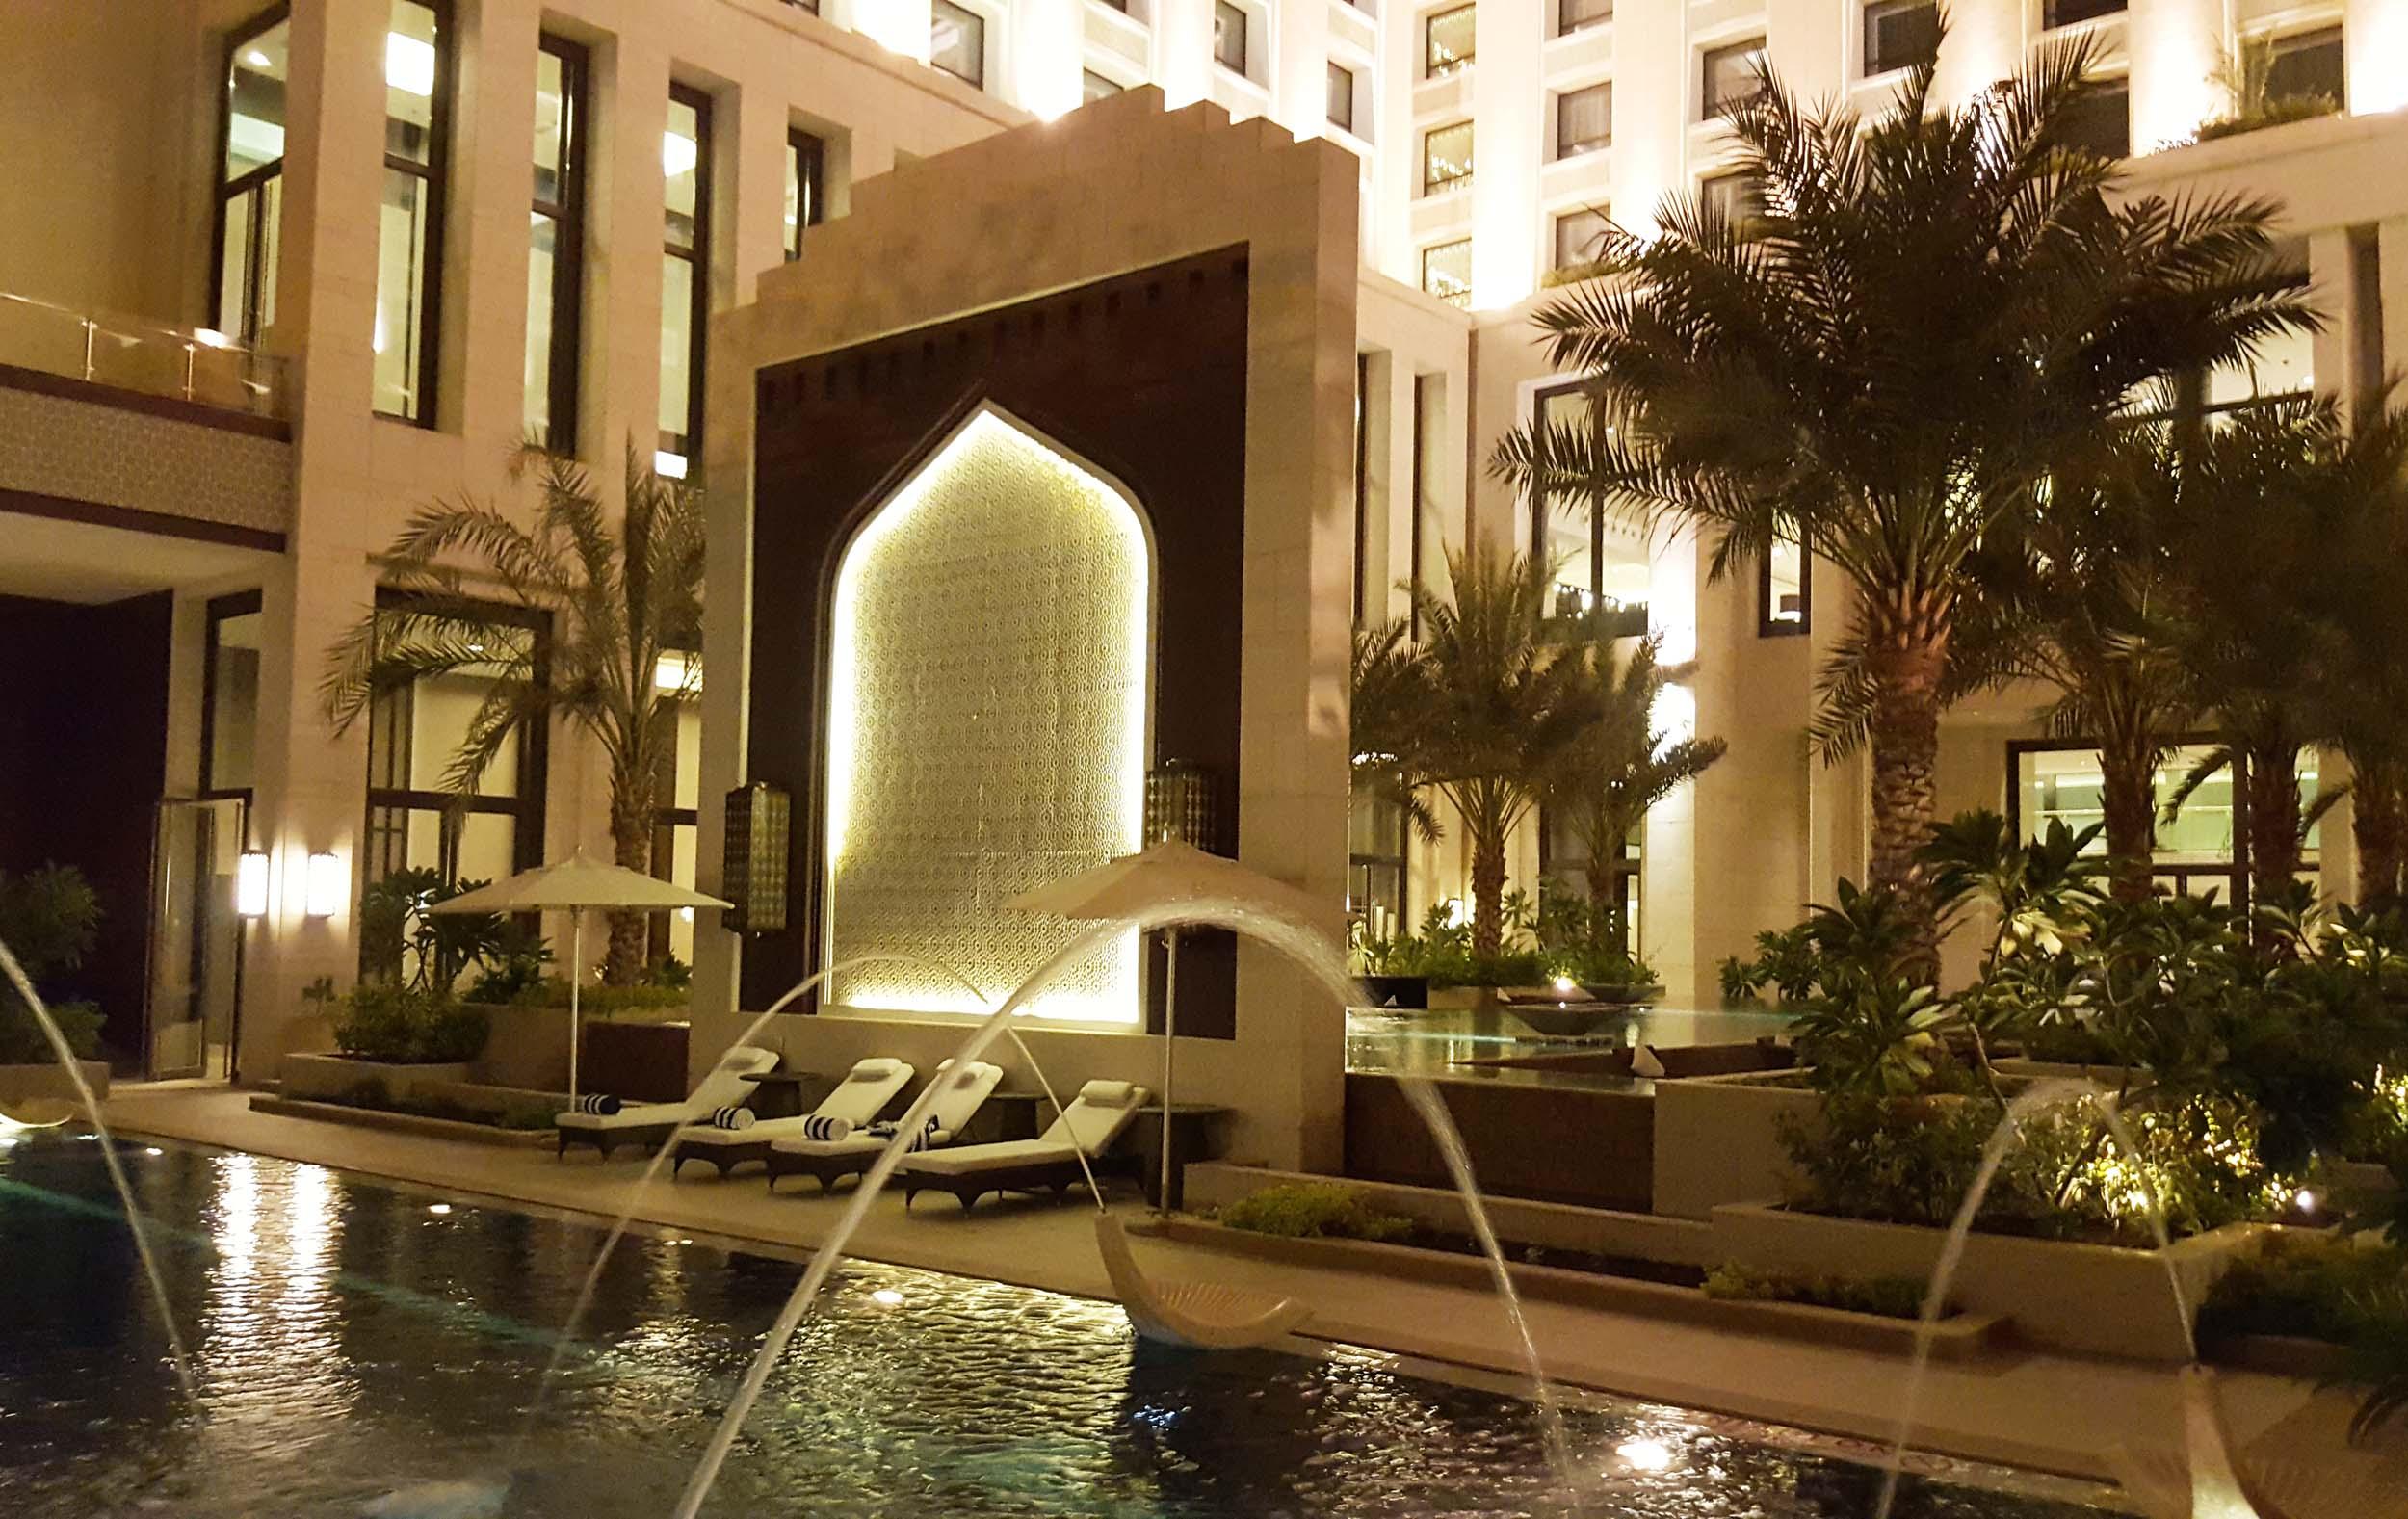 Oman, the Hormuz Grand pool and hotel